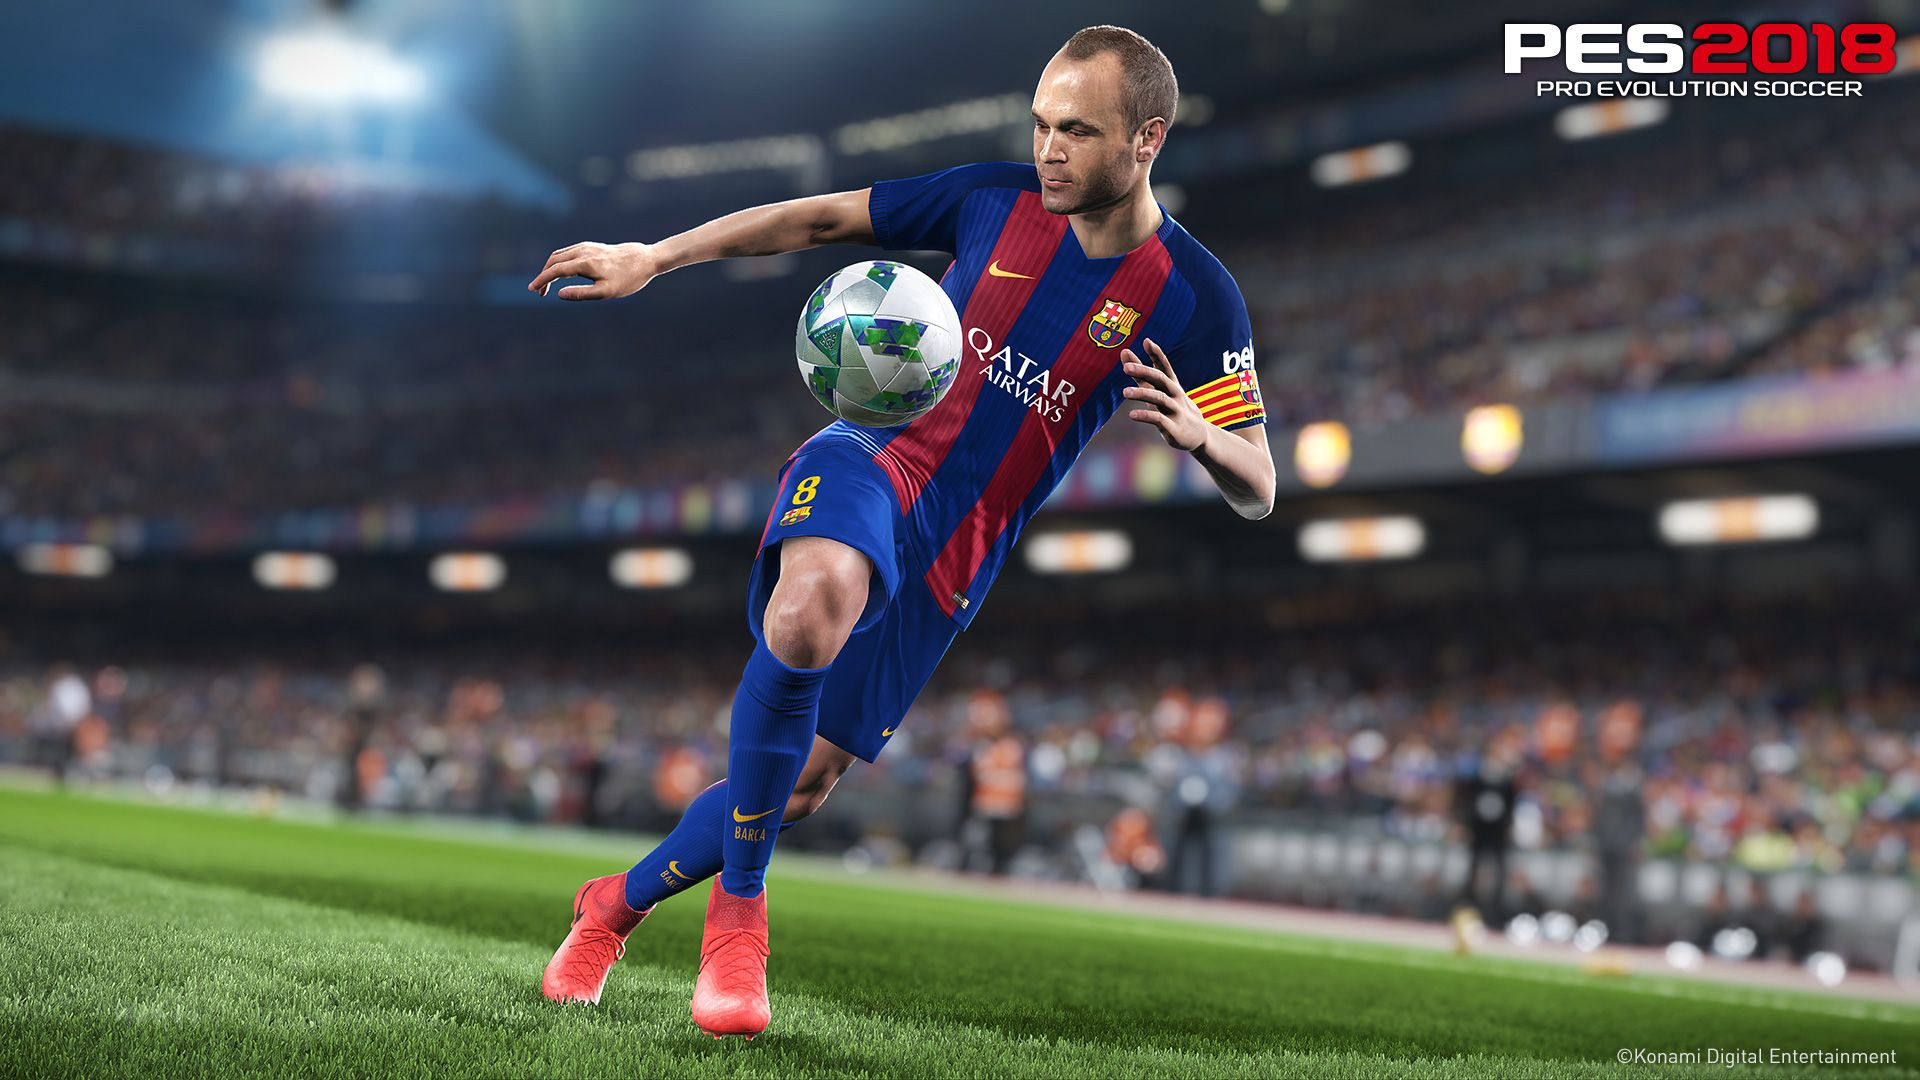 Pro cards fifa 2018 ciprian marica fifa 18 rating